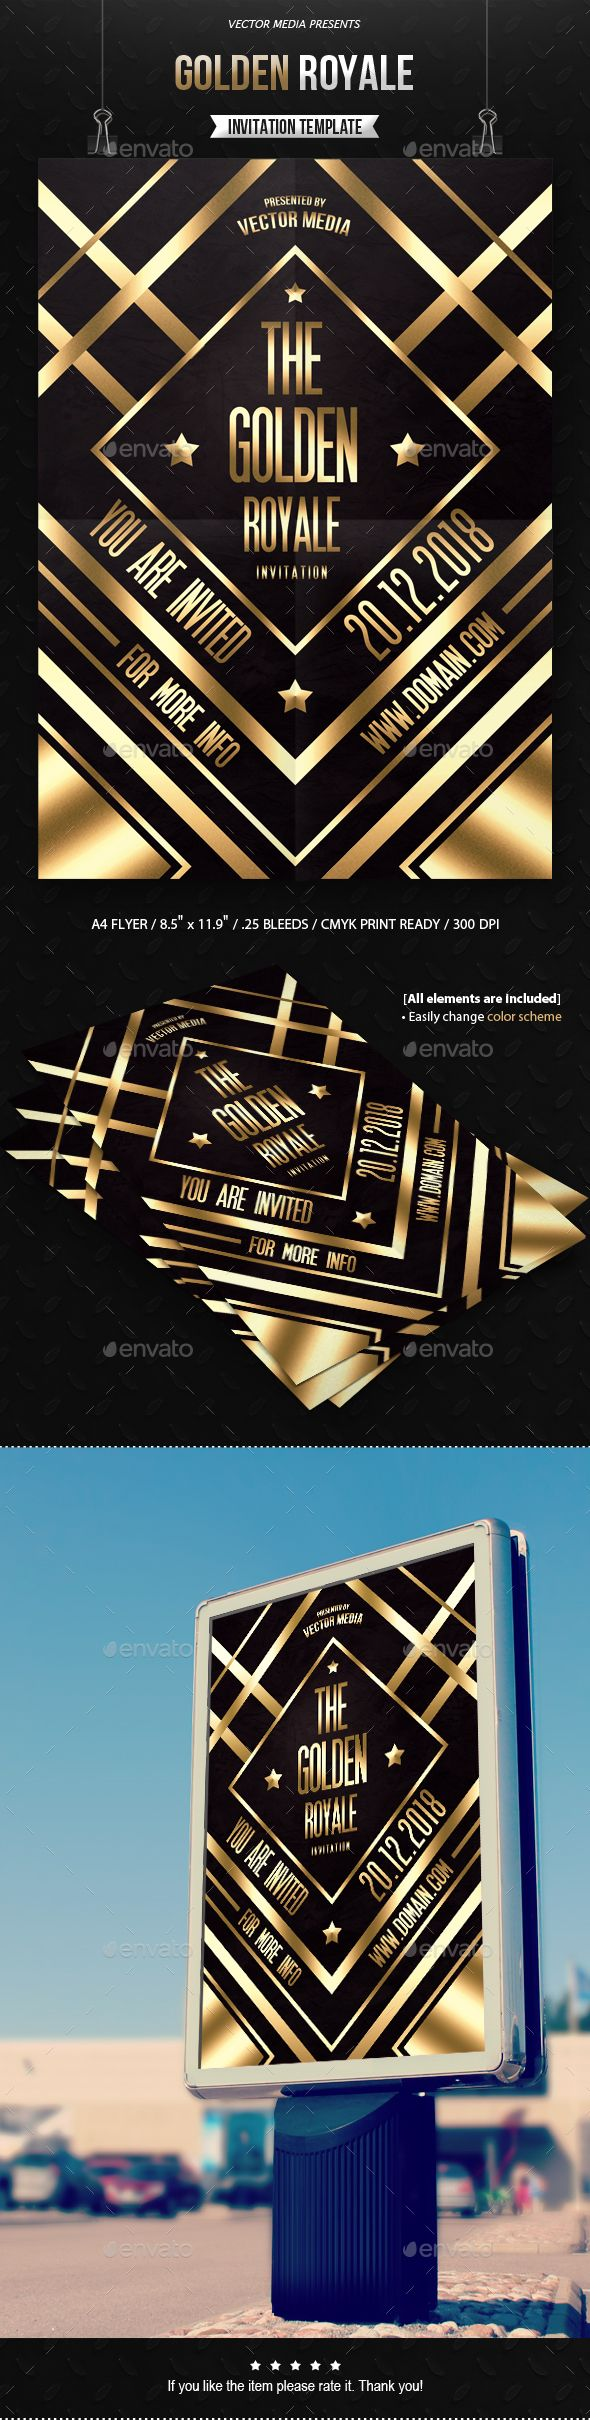 Golden Royale - Invitation